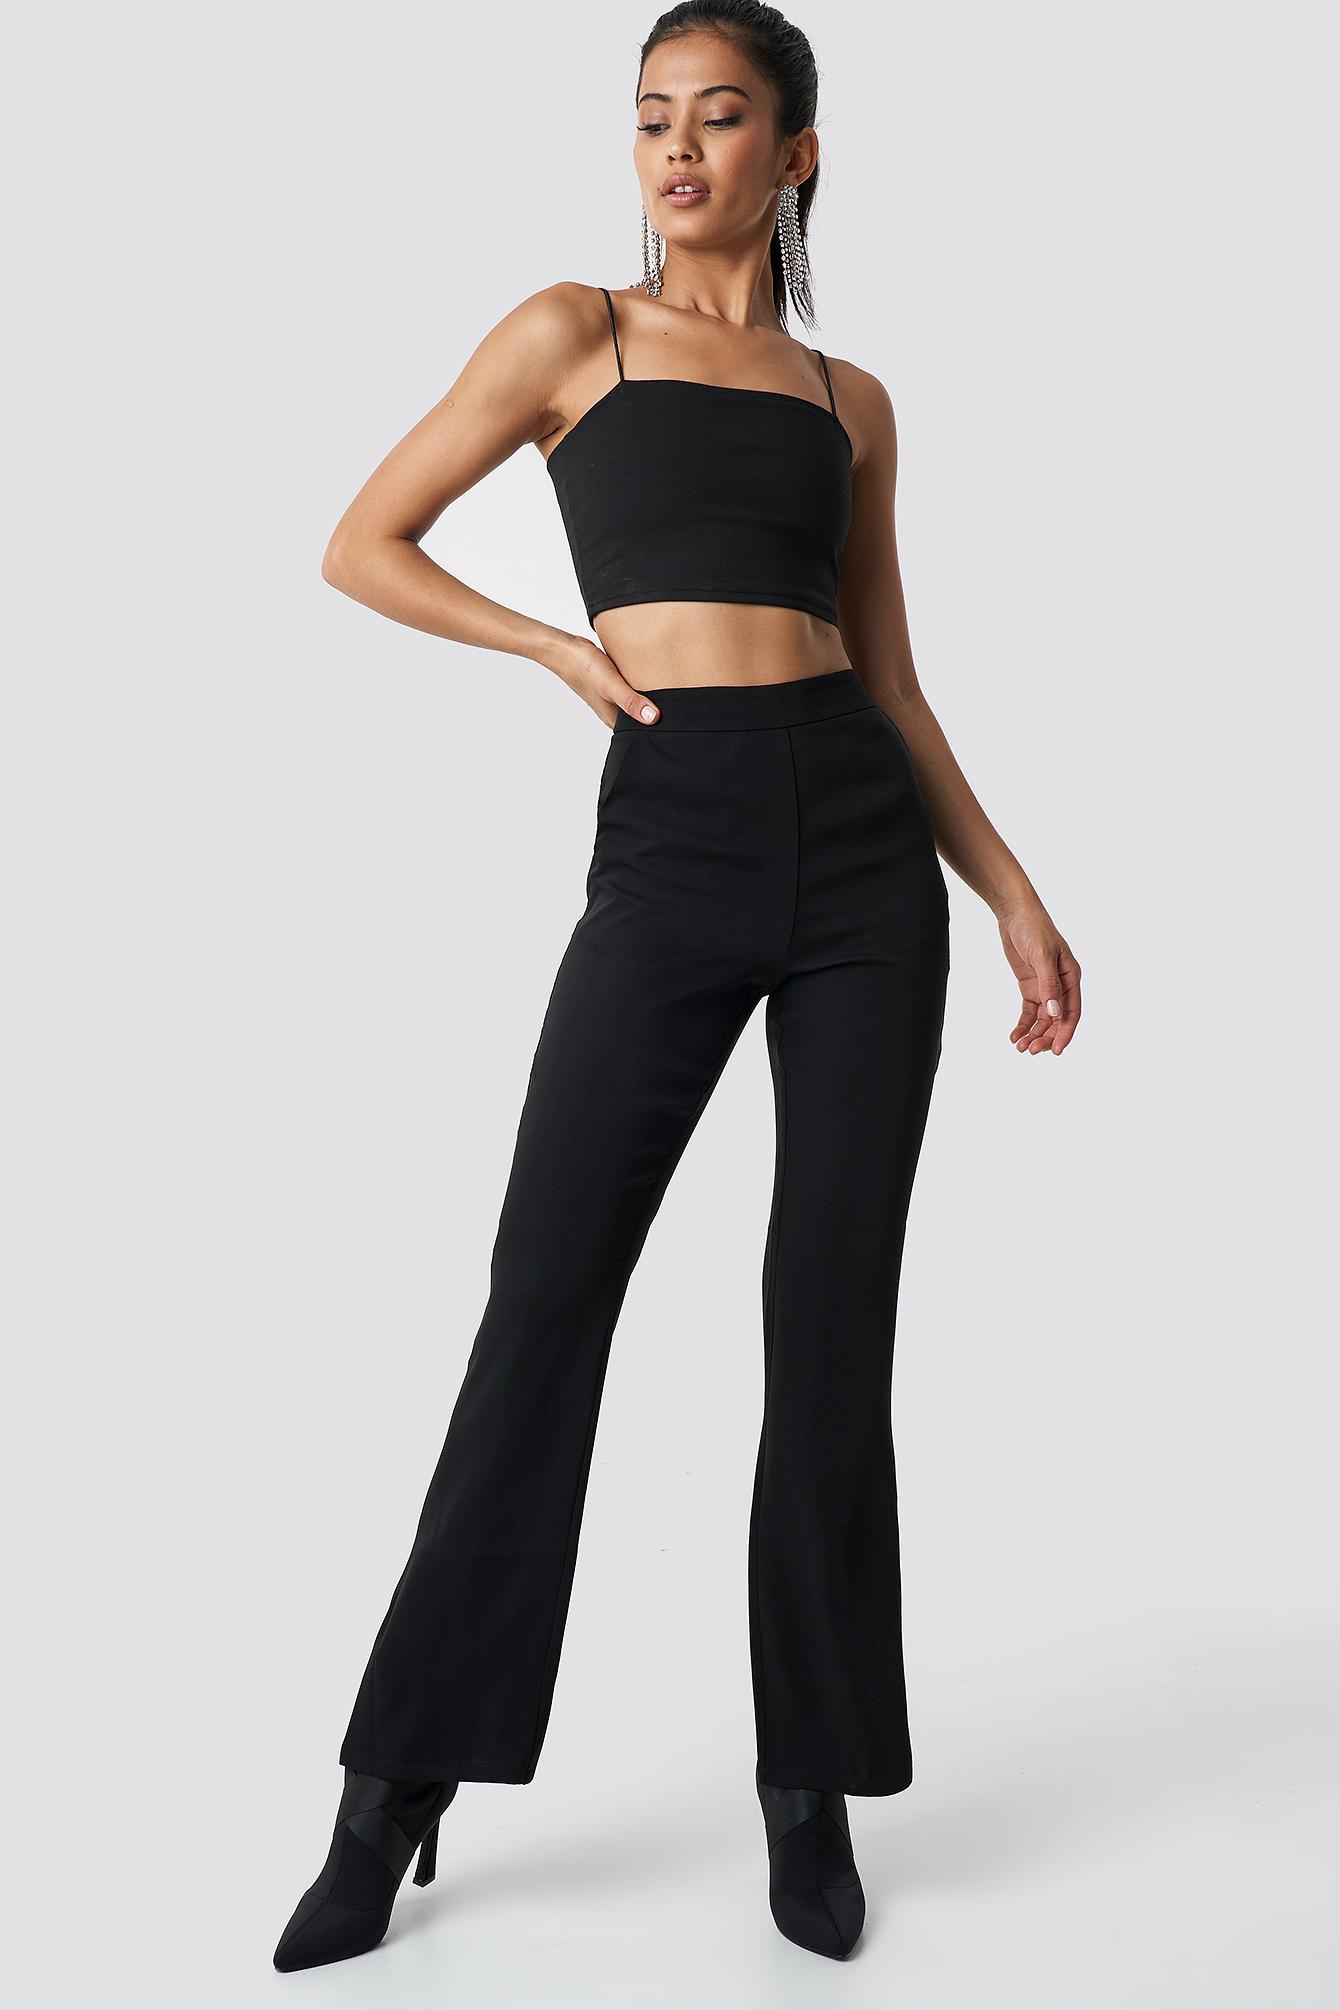 hannalicious x na-kd -  High Waist Bootcut Suit Pants - Black